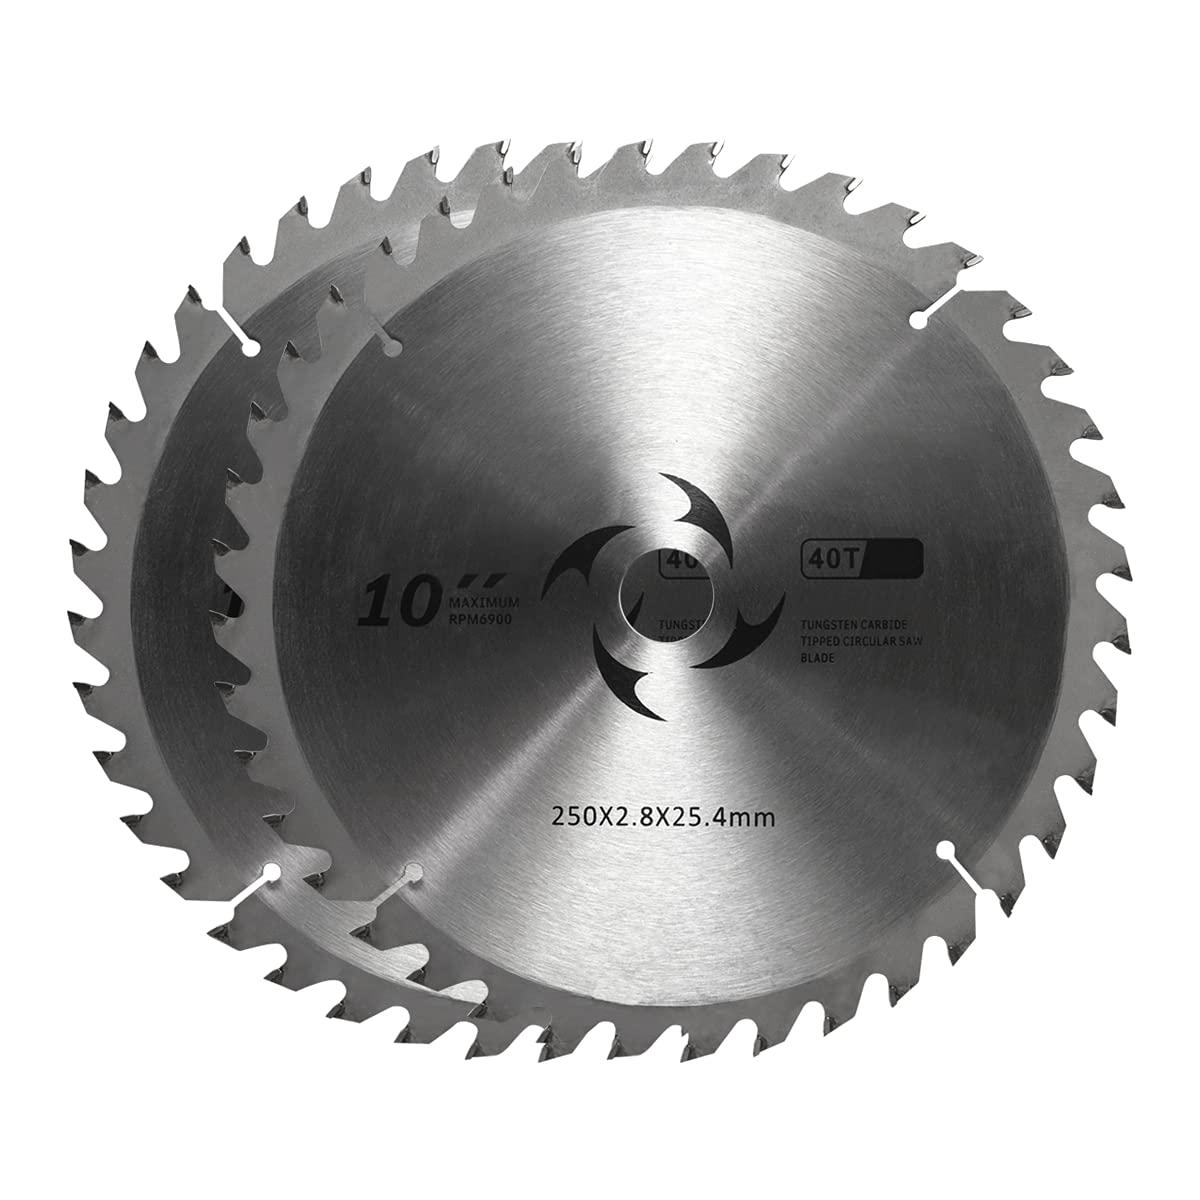 Toocust Blades Saw 10 New York Mall Cheap SALE Start Blade Inch Carbide Circular